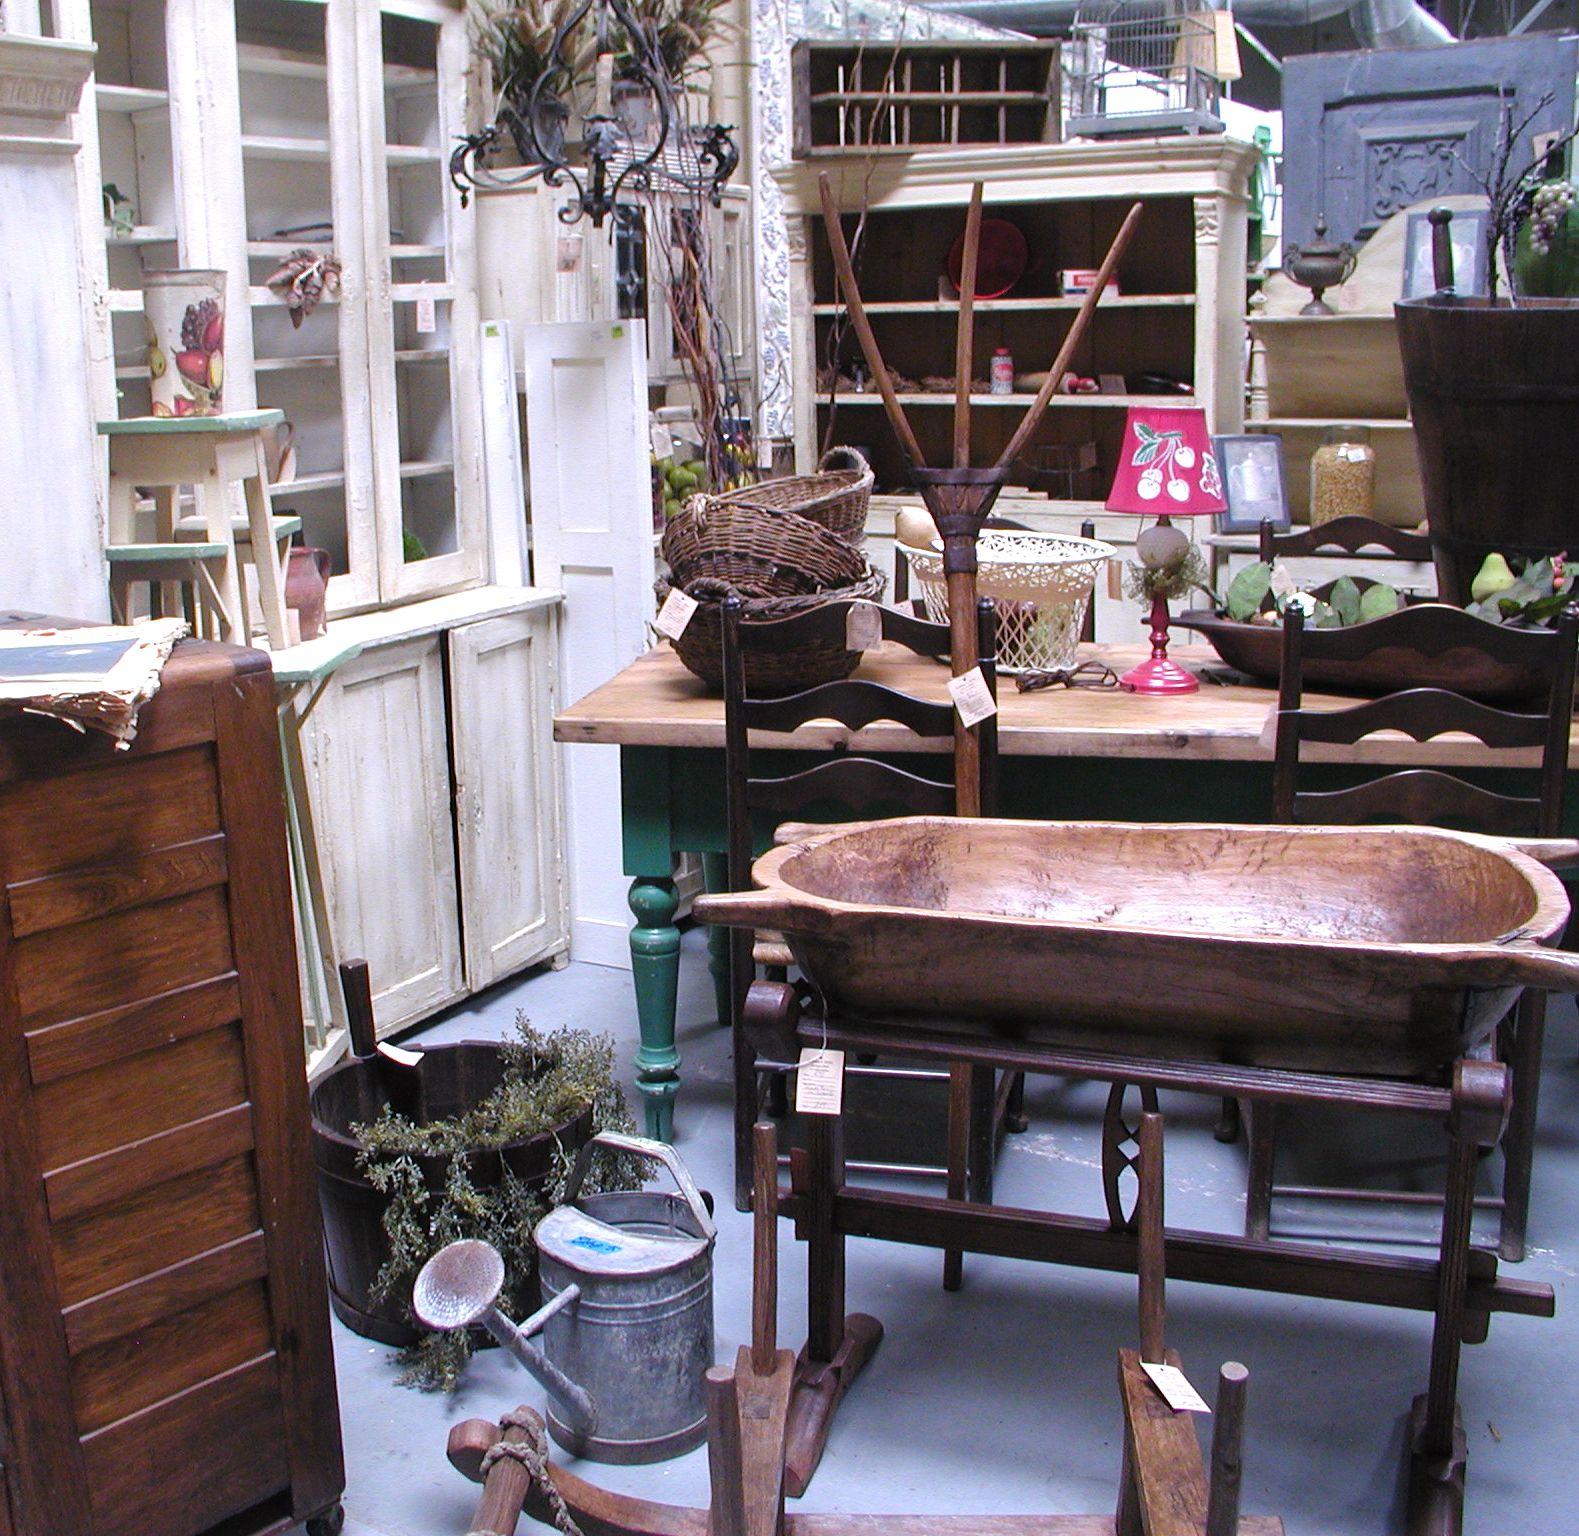 Furniture Stores Near Temecula Ca Rustic Furniture Collections Murrieta Ca Room Ornament